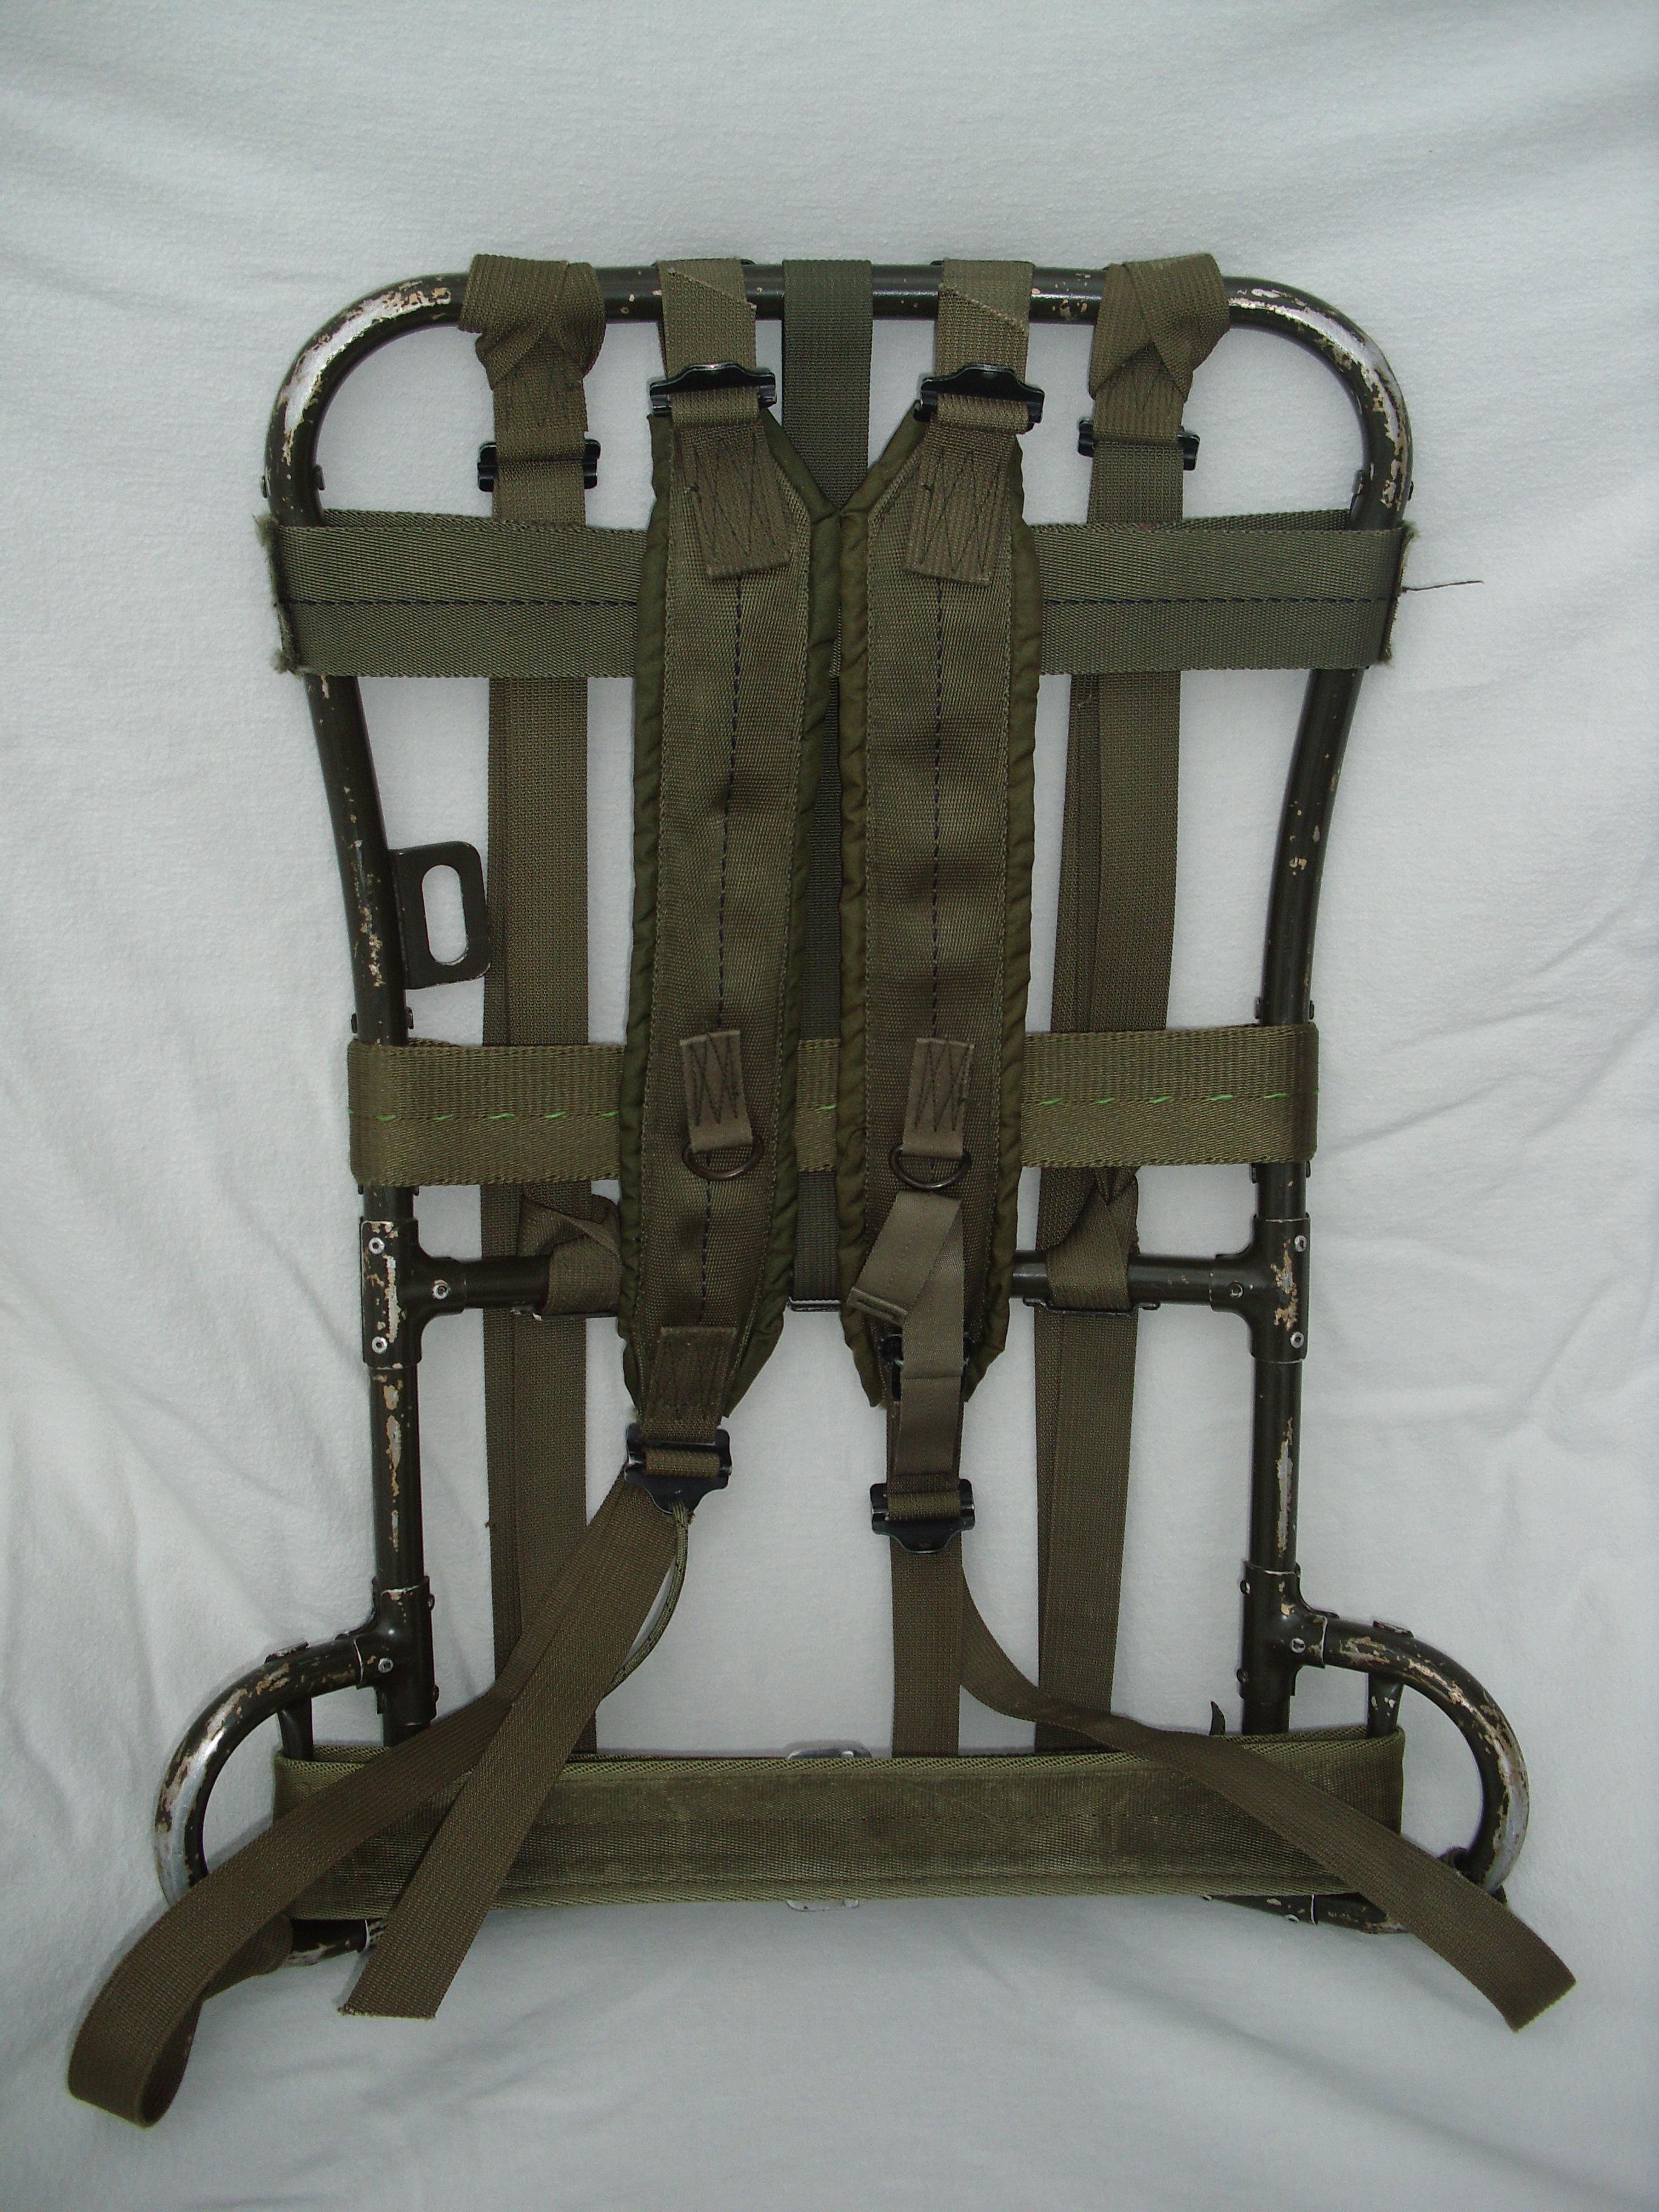 Datei:Lightweight Rucksack Frame 1.JPG – Wikipedia